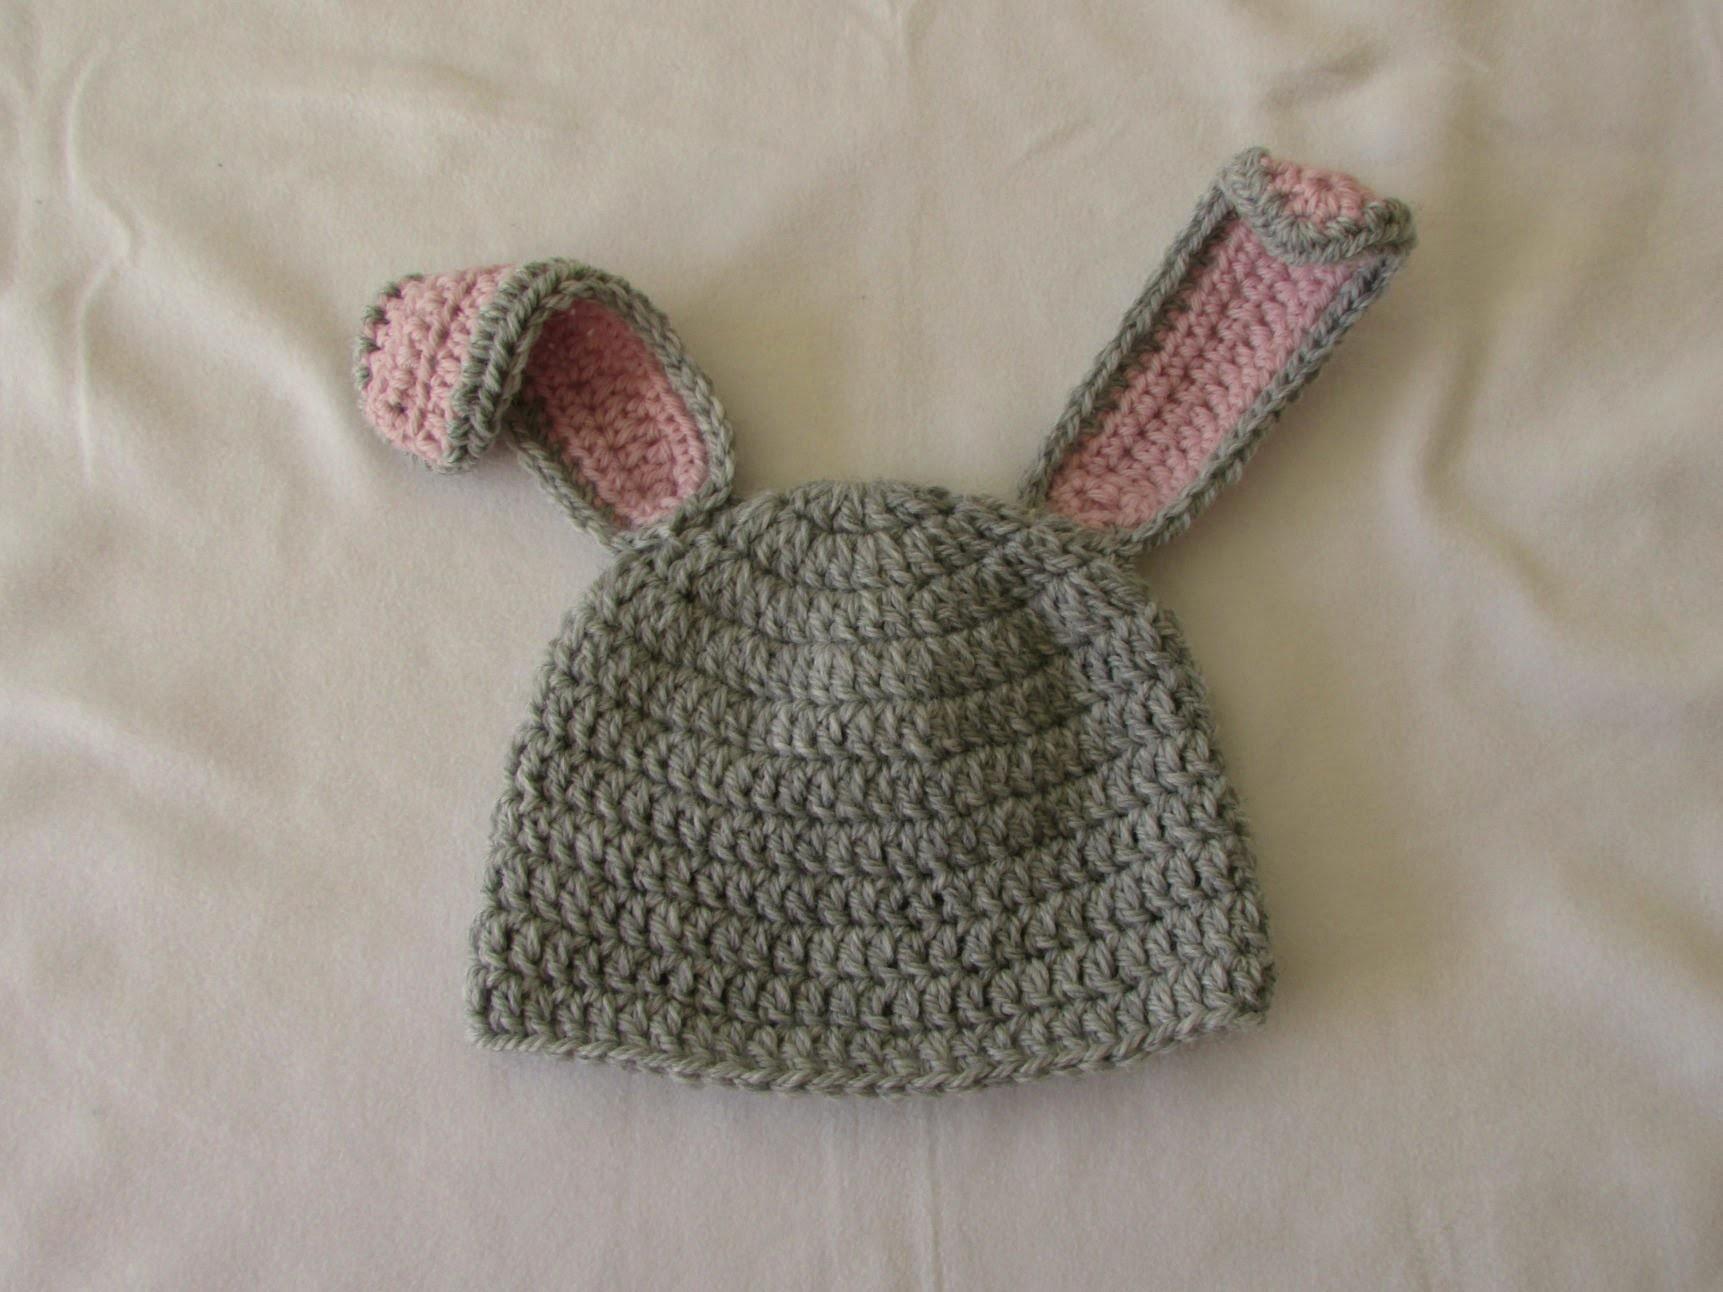 VERY EASY crochet baby. child's bunny hat tutorial - Part 1